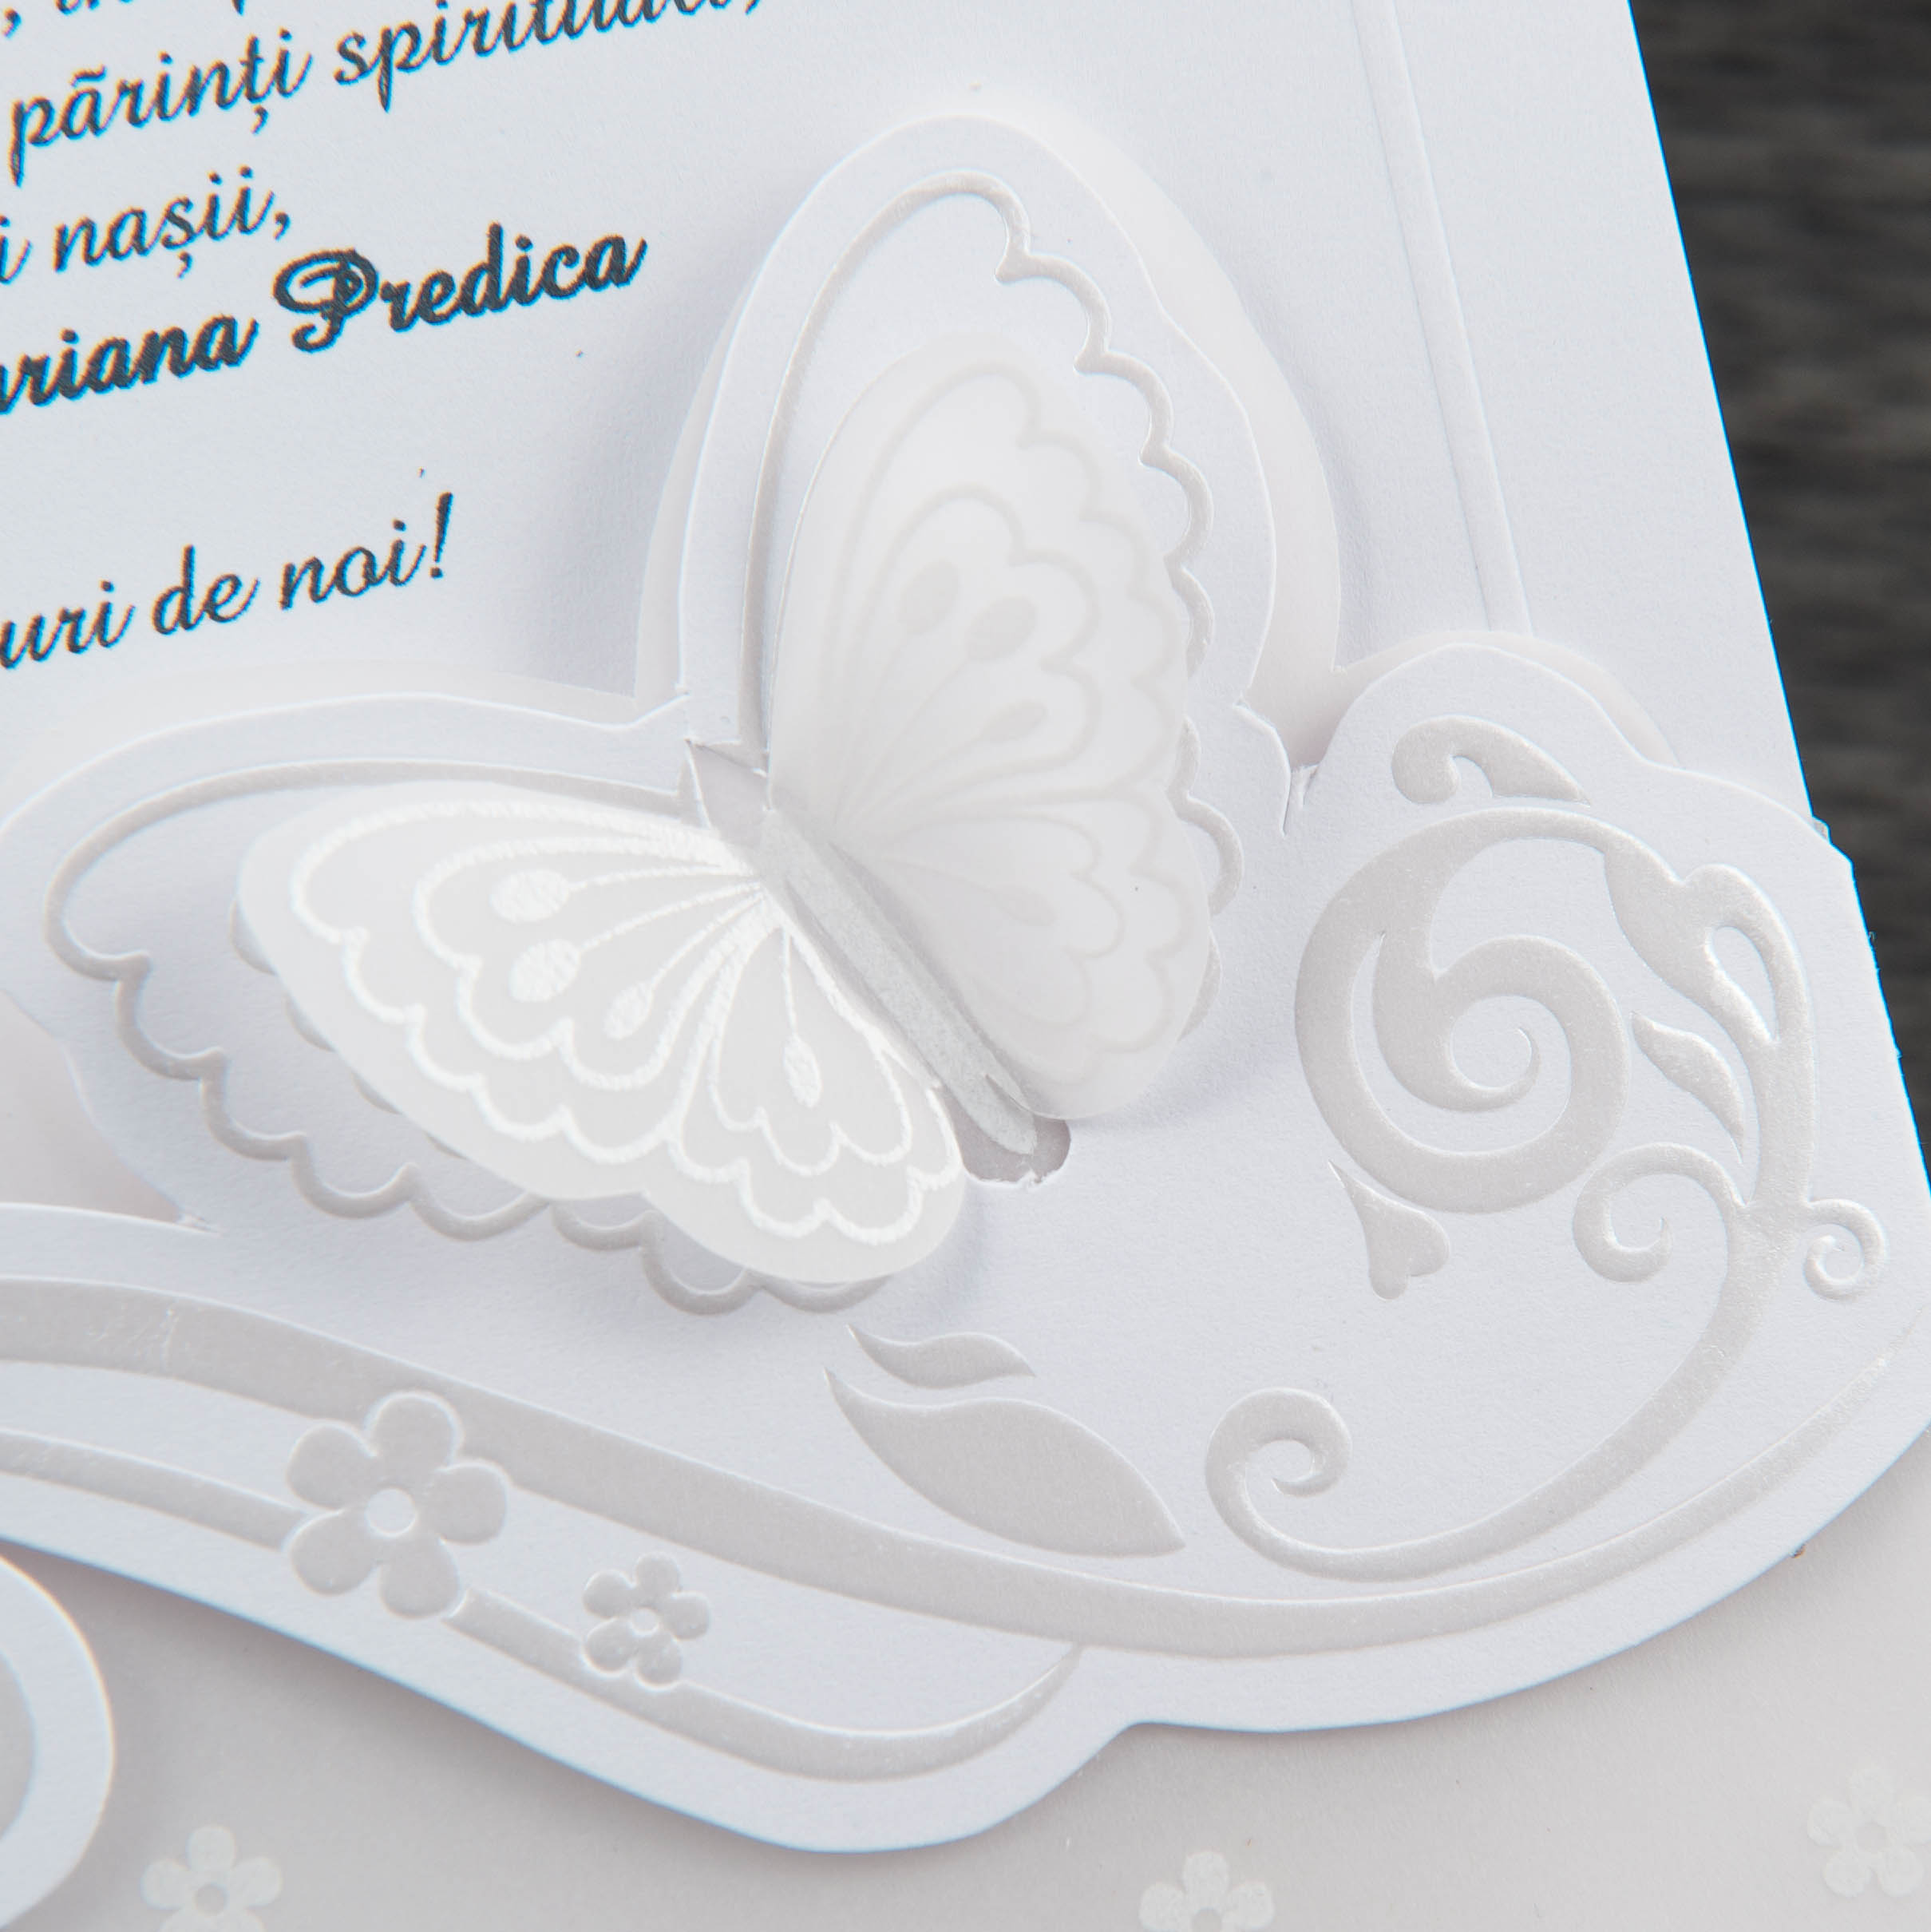 Invitatii Nunta 20415 Invitatii Garf